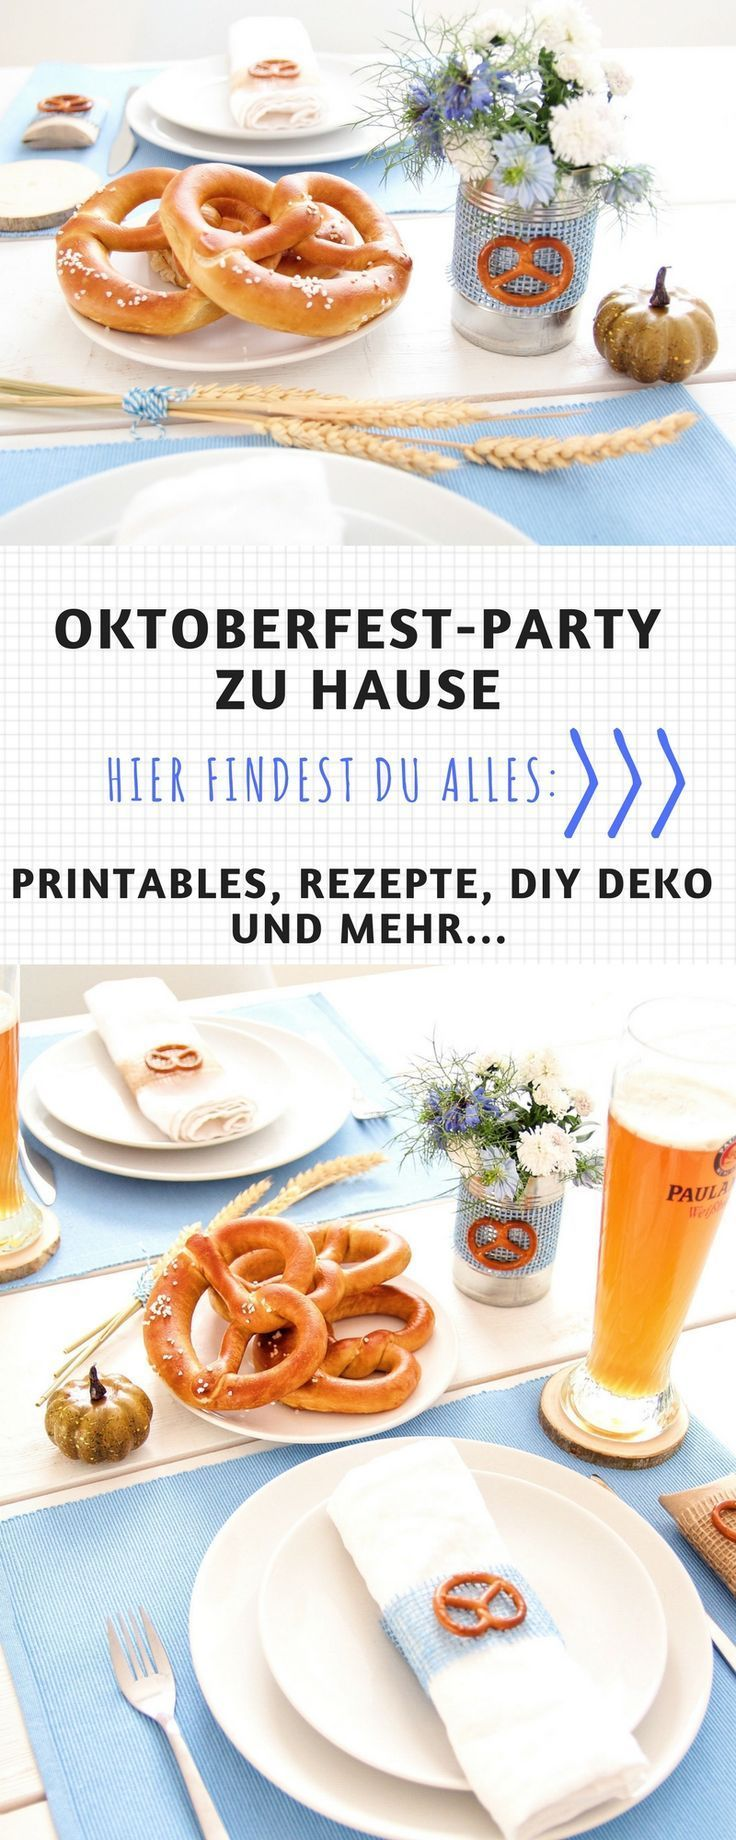 Oktoberfest-Party Zuhause | Festzelt-Stimmung dahoam